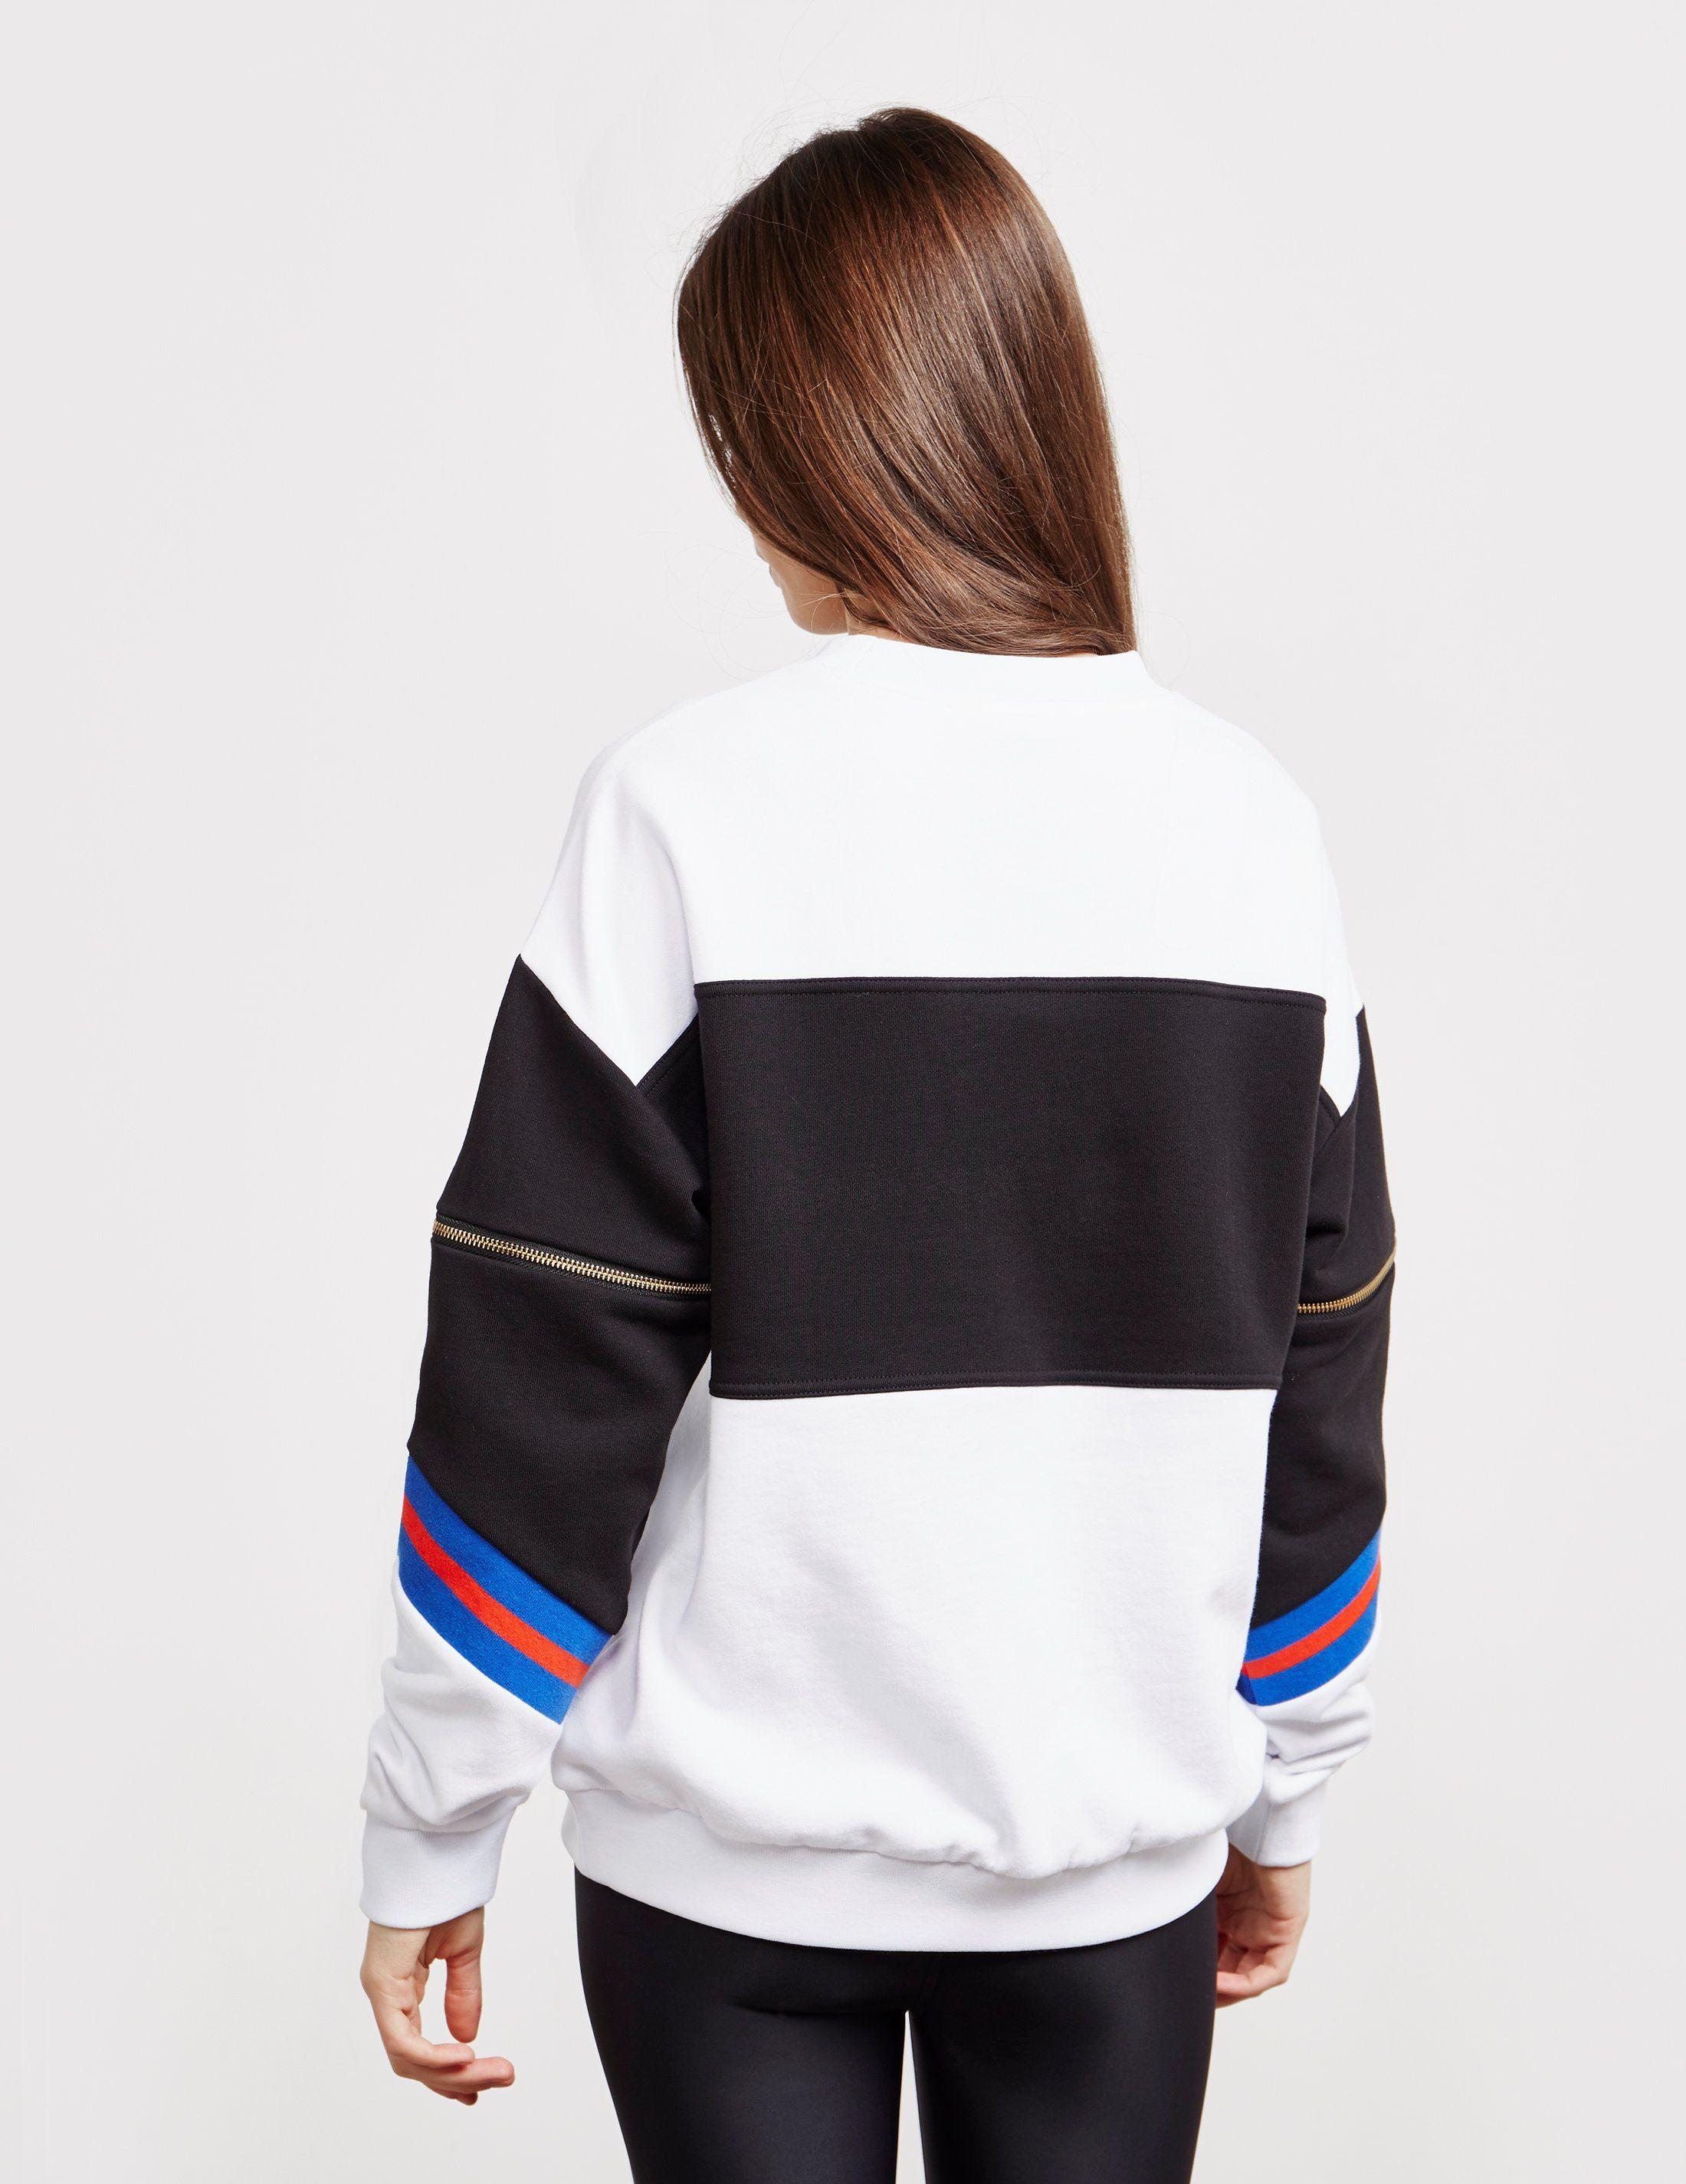 P.E Nation Centurion Sweatshirt